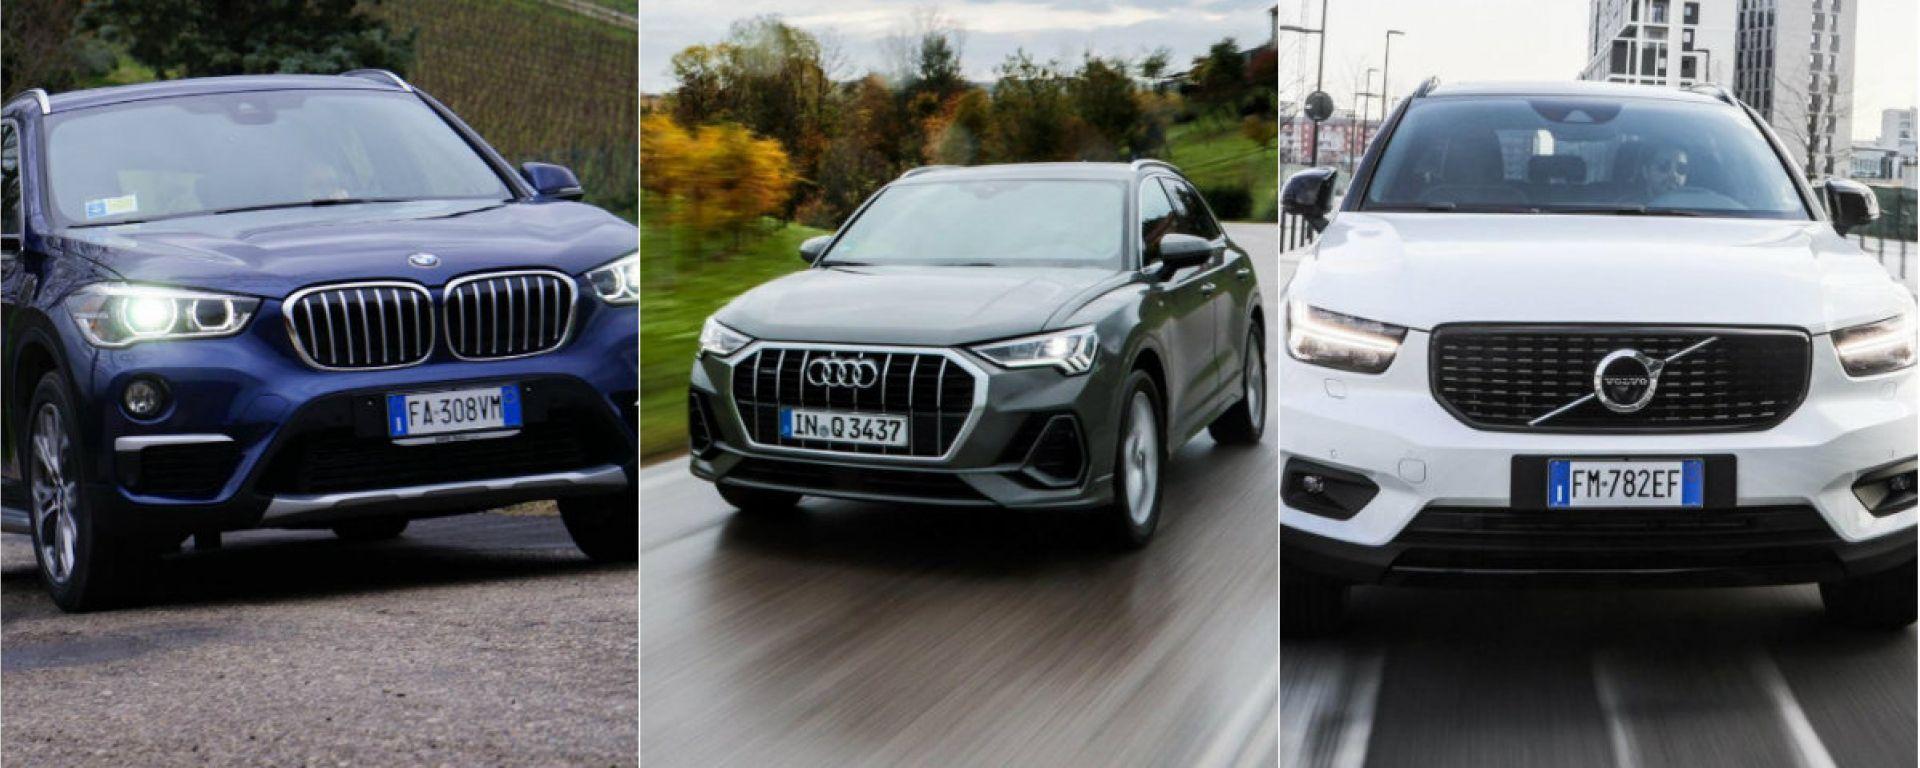 BMW X1 vs Audi Q3 vs Volvo XC40, il verdetto degli esperti UK